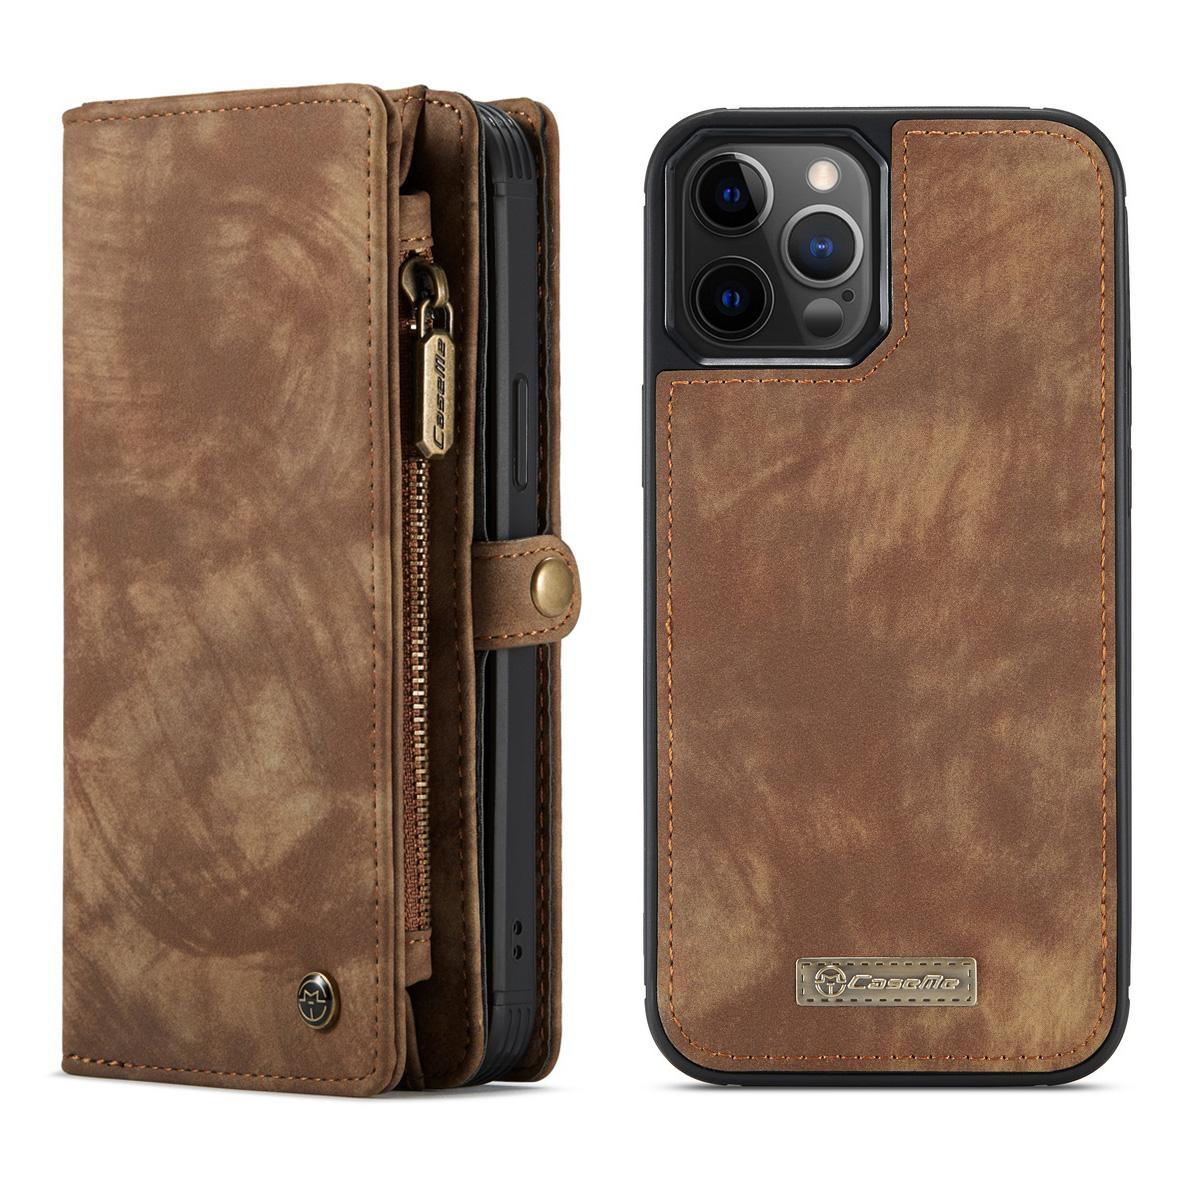 CaseMe 008 Series läderfodral, iPhone 12 Pro Max, brun